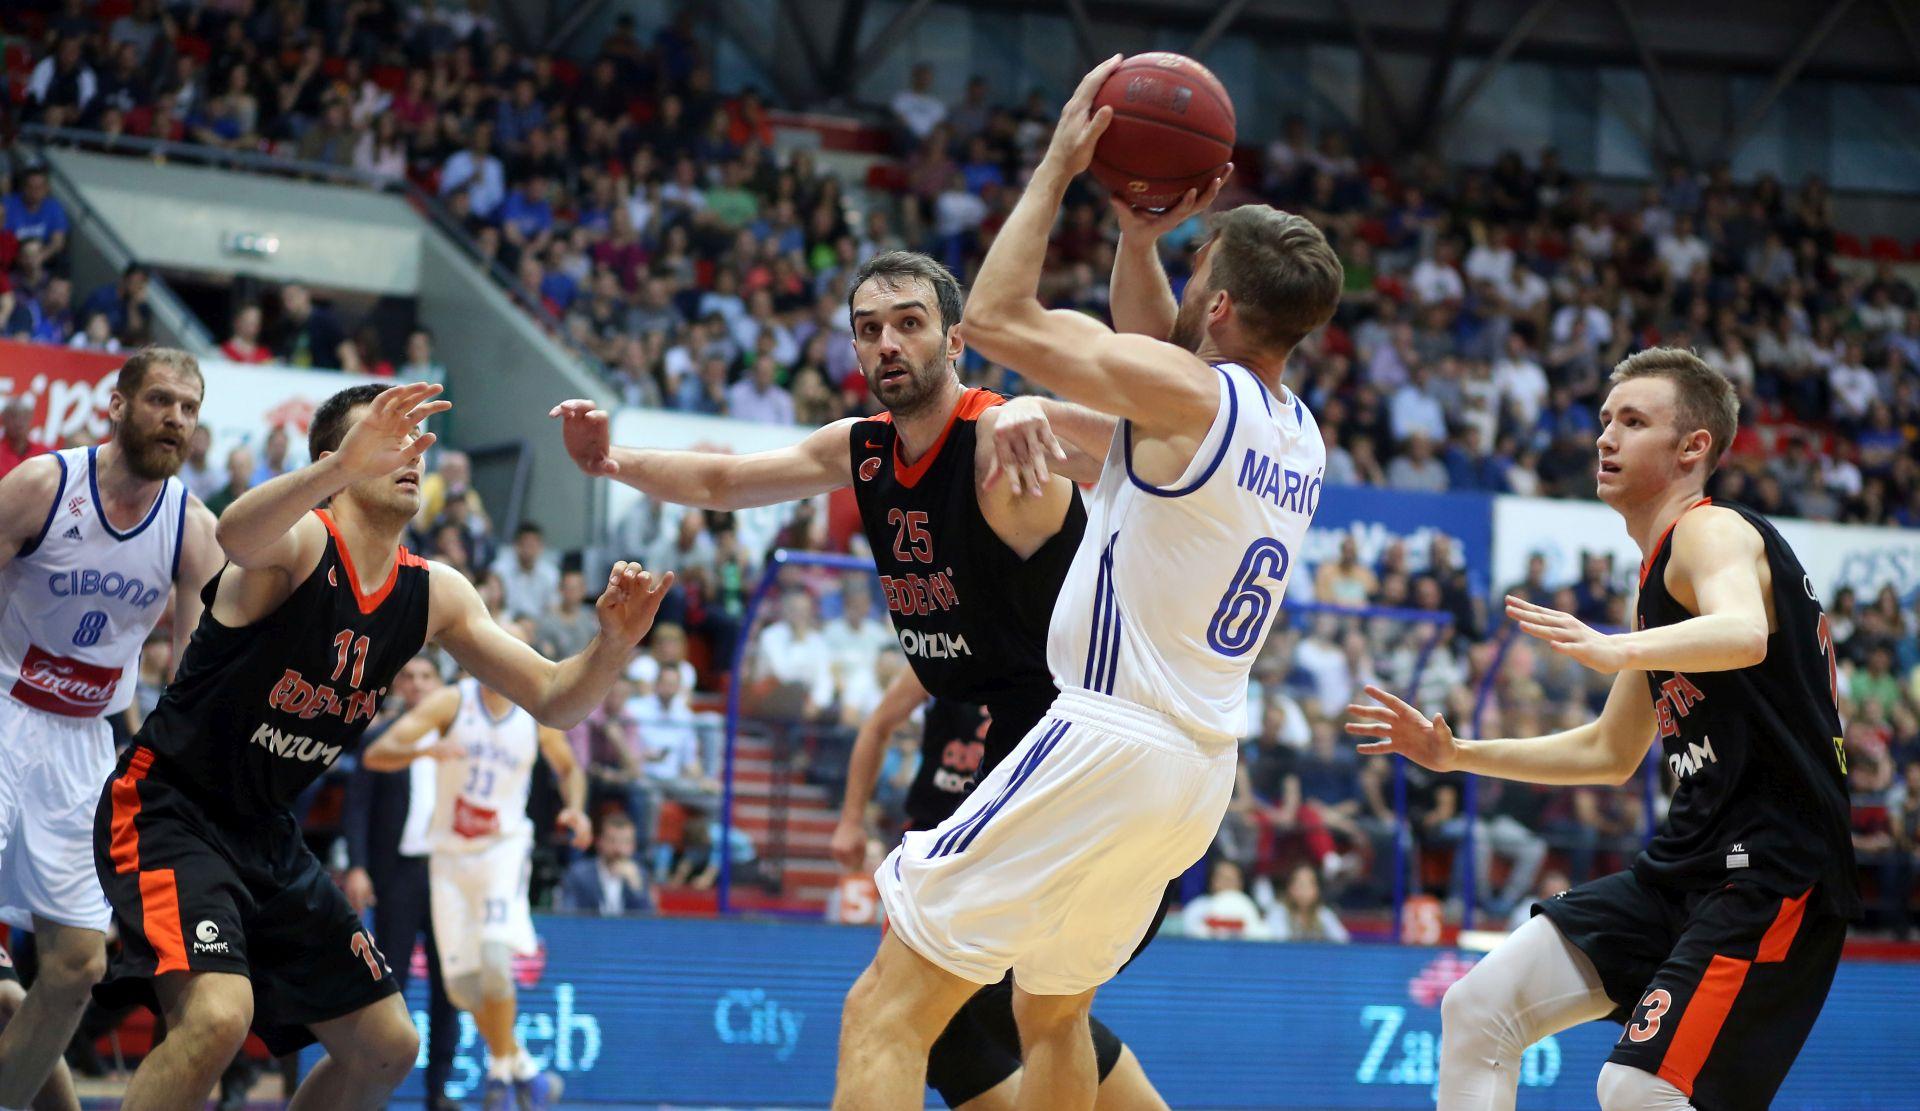 PH košarka – Cibona izborila meč loptu